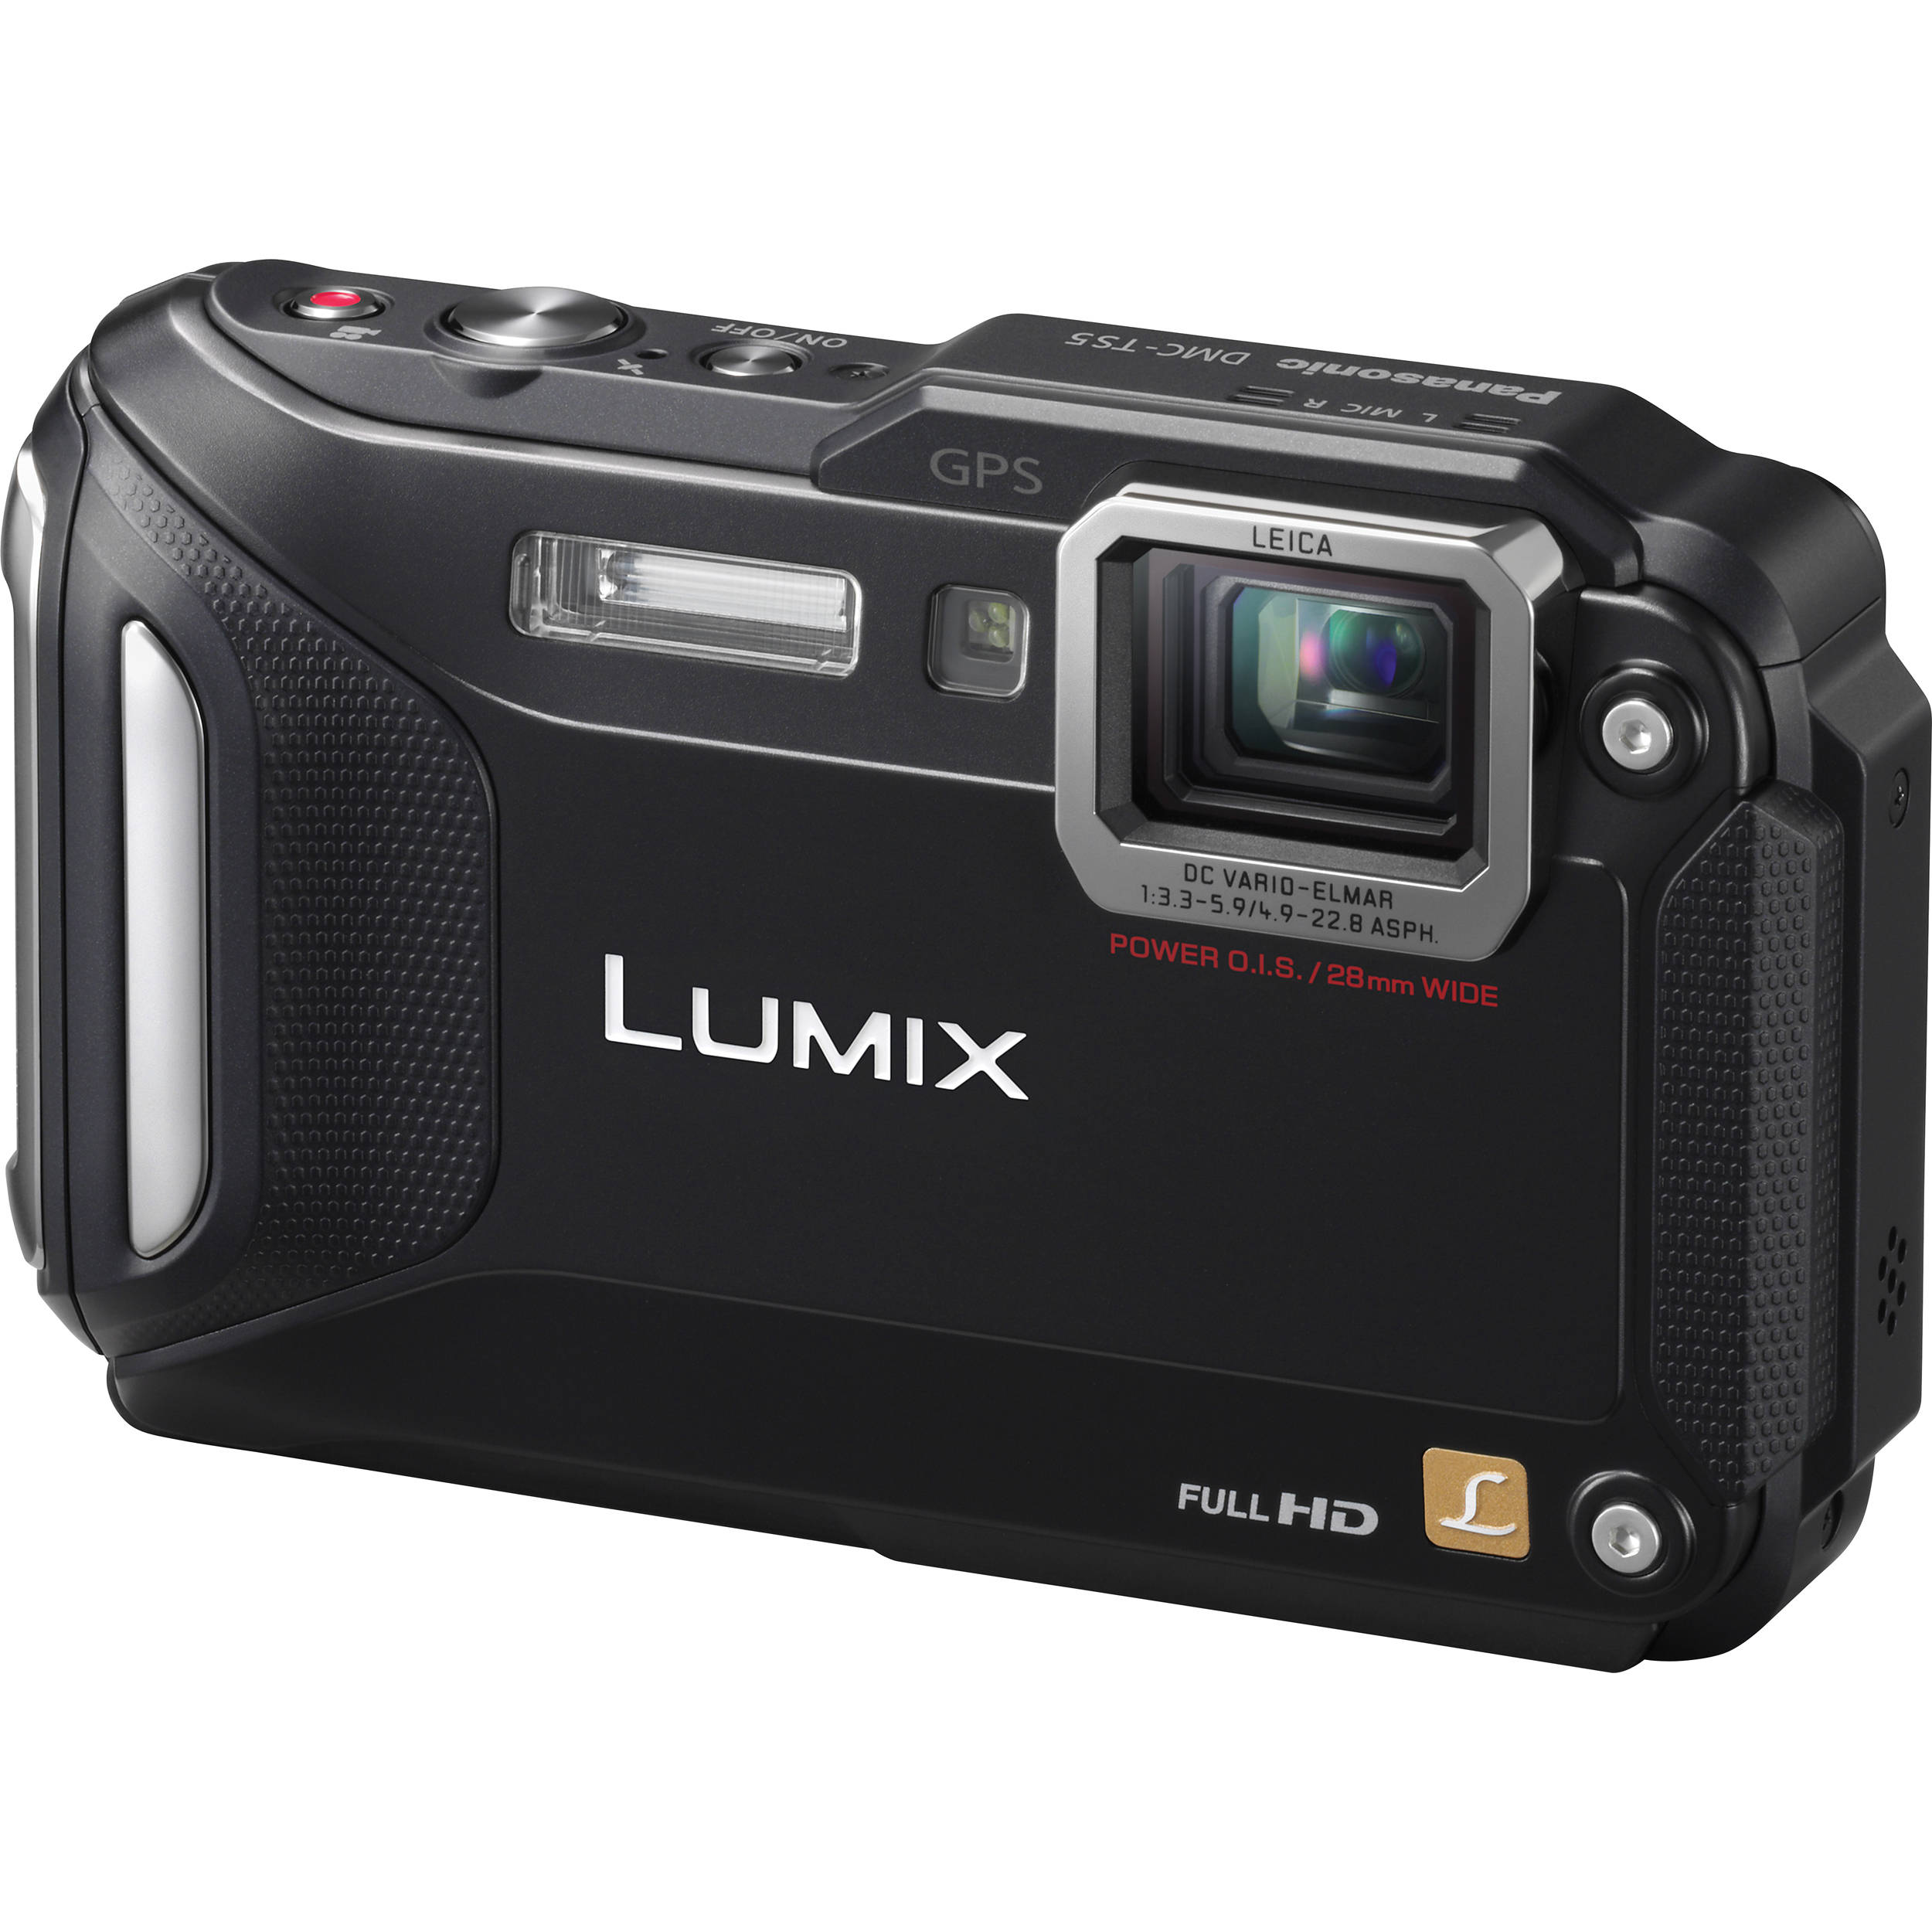 Panasonic DMC-TS5 Camera Windows 8 X64